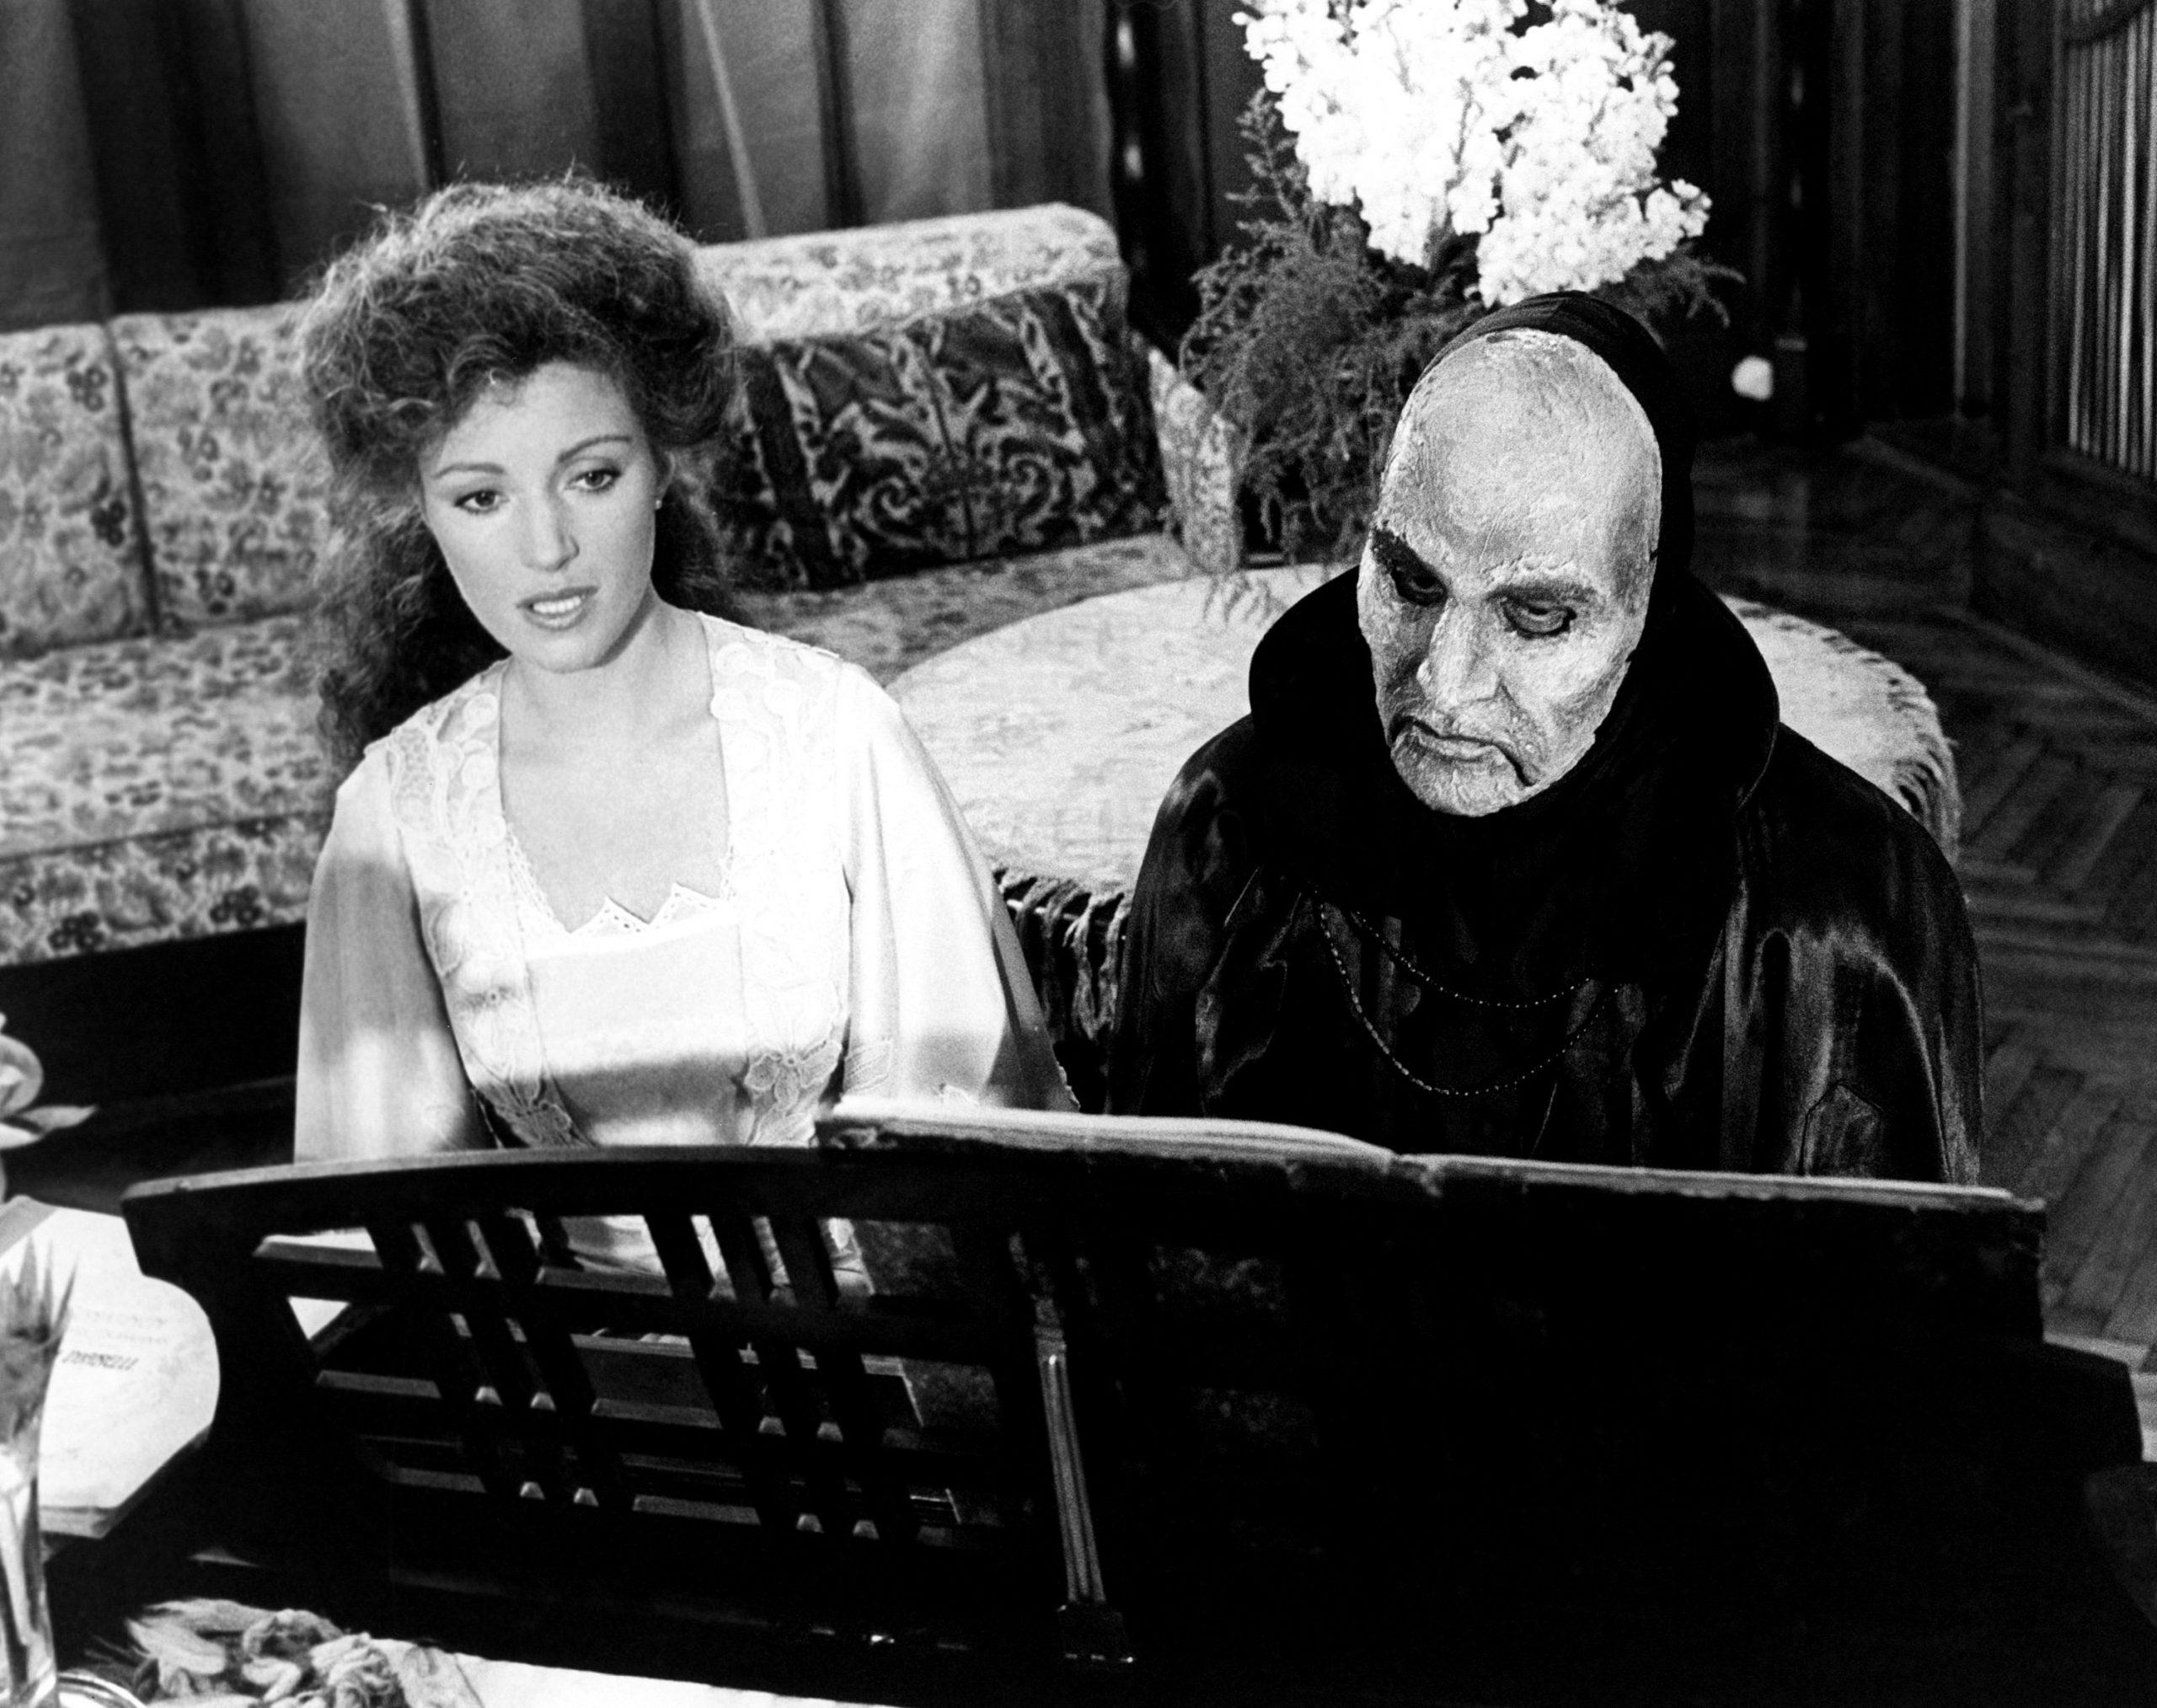 jane-seymour-the-phantom-of-the-opera